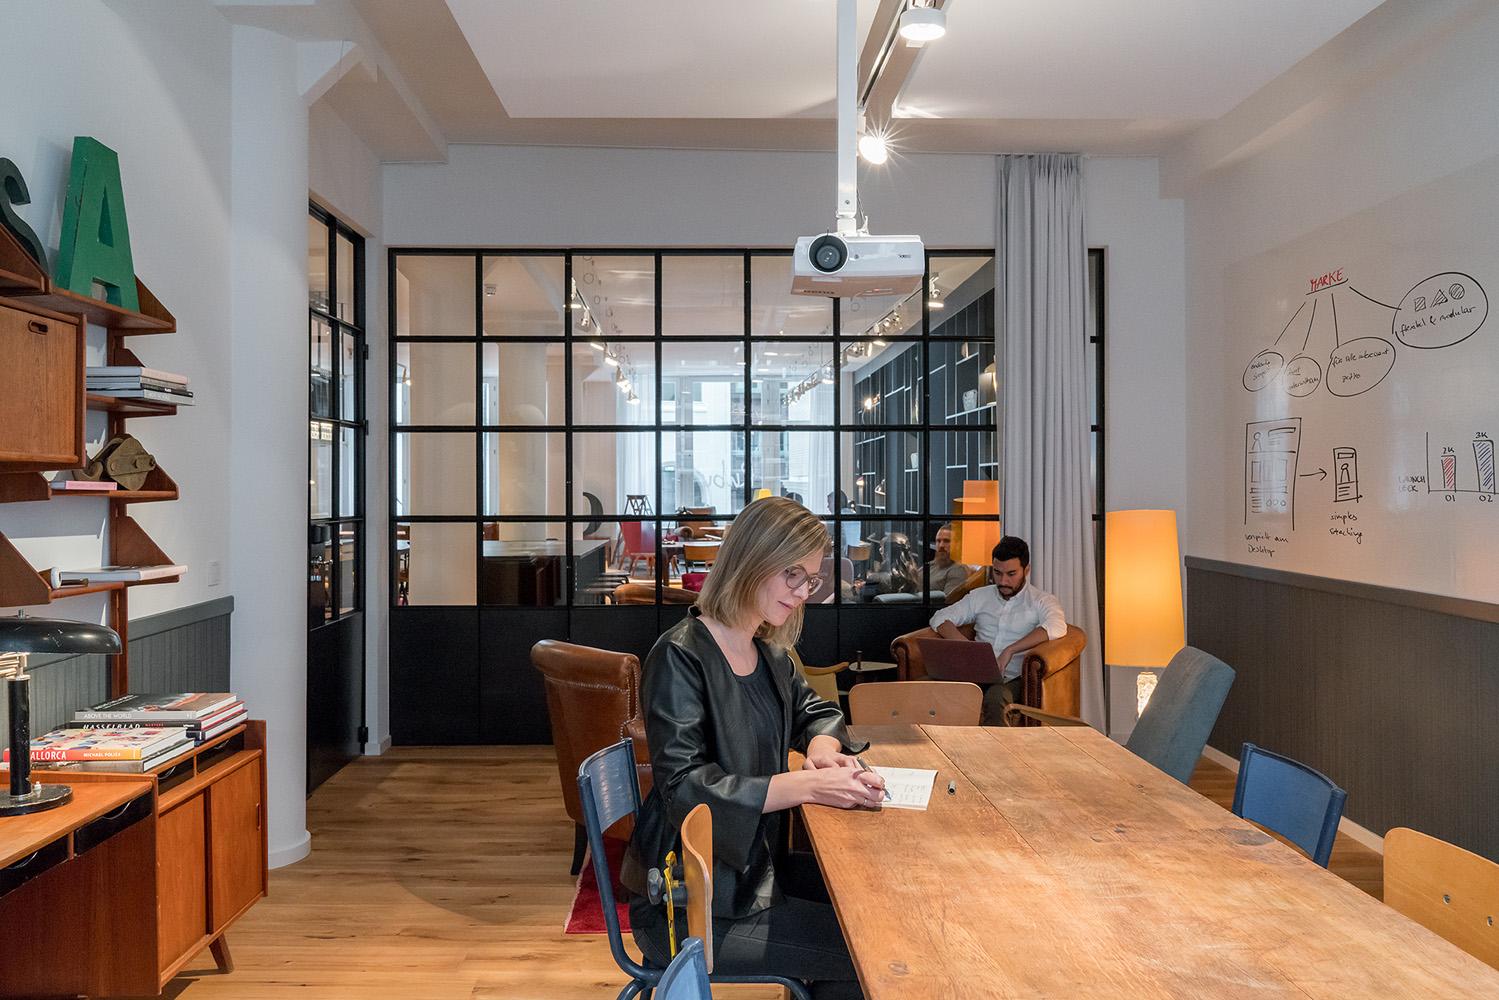 b ro mieten in hamburg steinh ft 9. Black Bedroom Furniture Sets. Home Design Ideas